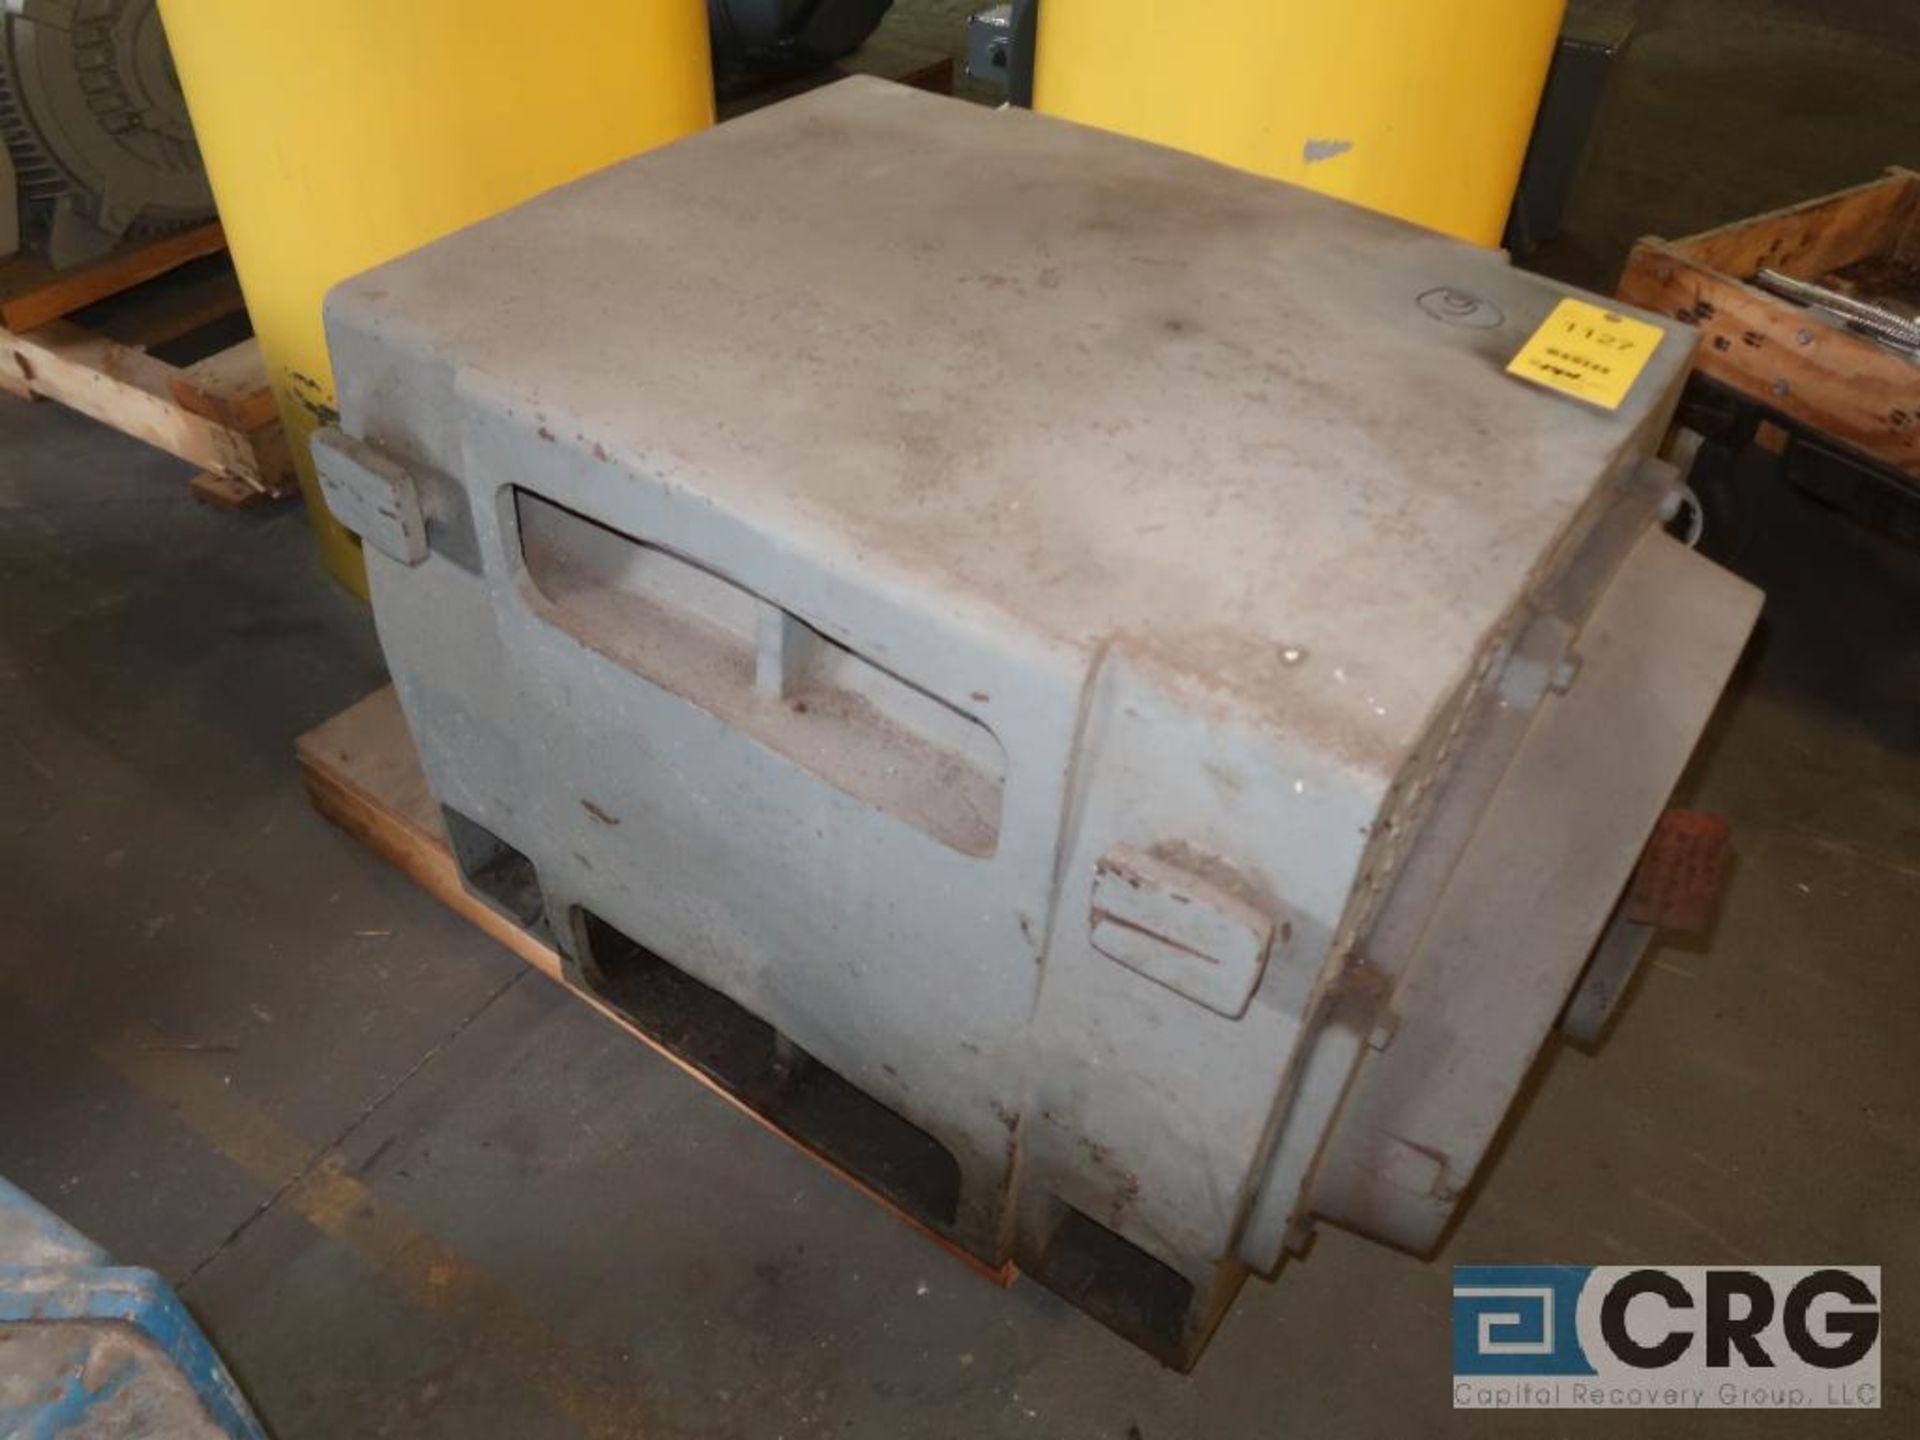 General Electric A-C motor, 300 HP, 1,185 RPMs, 2,300 volt, 3 ph., 509LL frame (Finish Building)